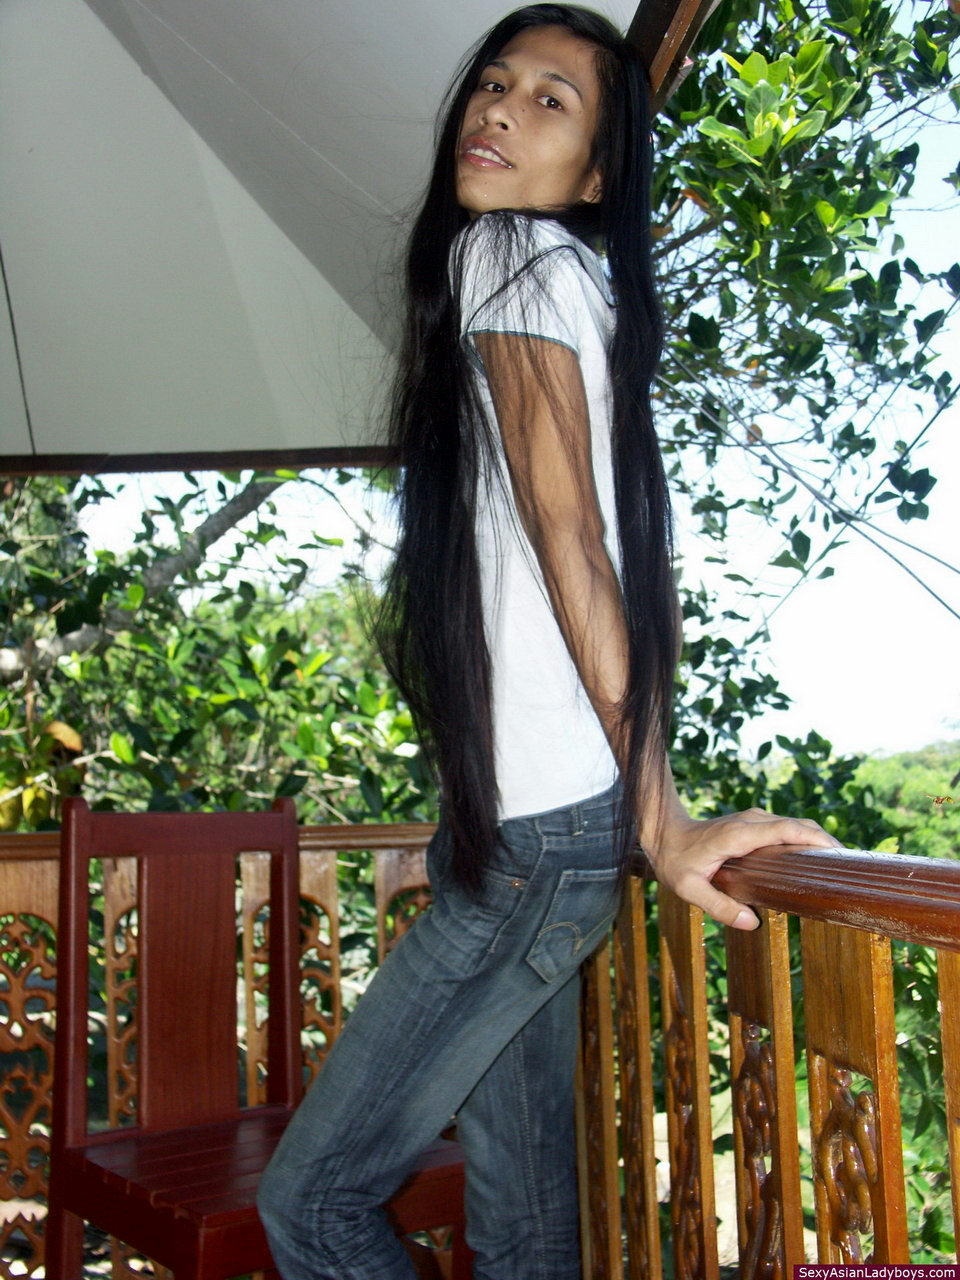 Very Slender Asian T-Girl Stripping For Us